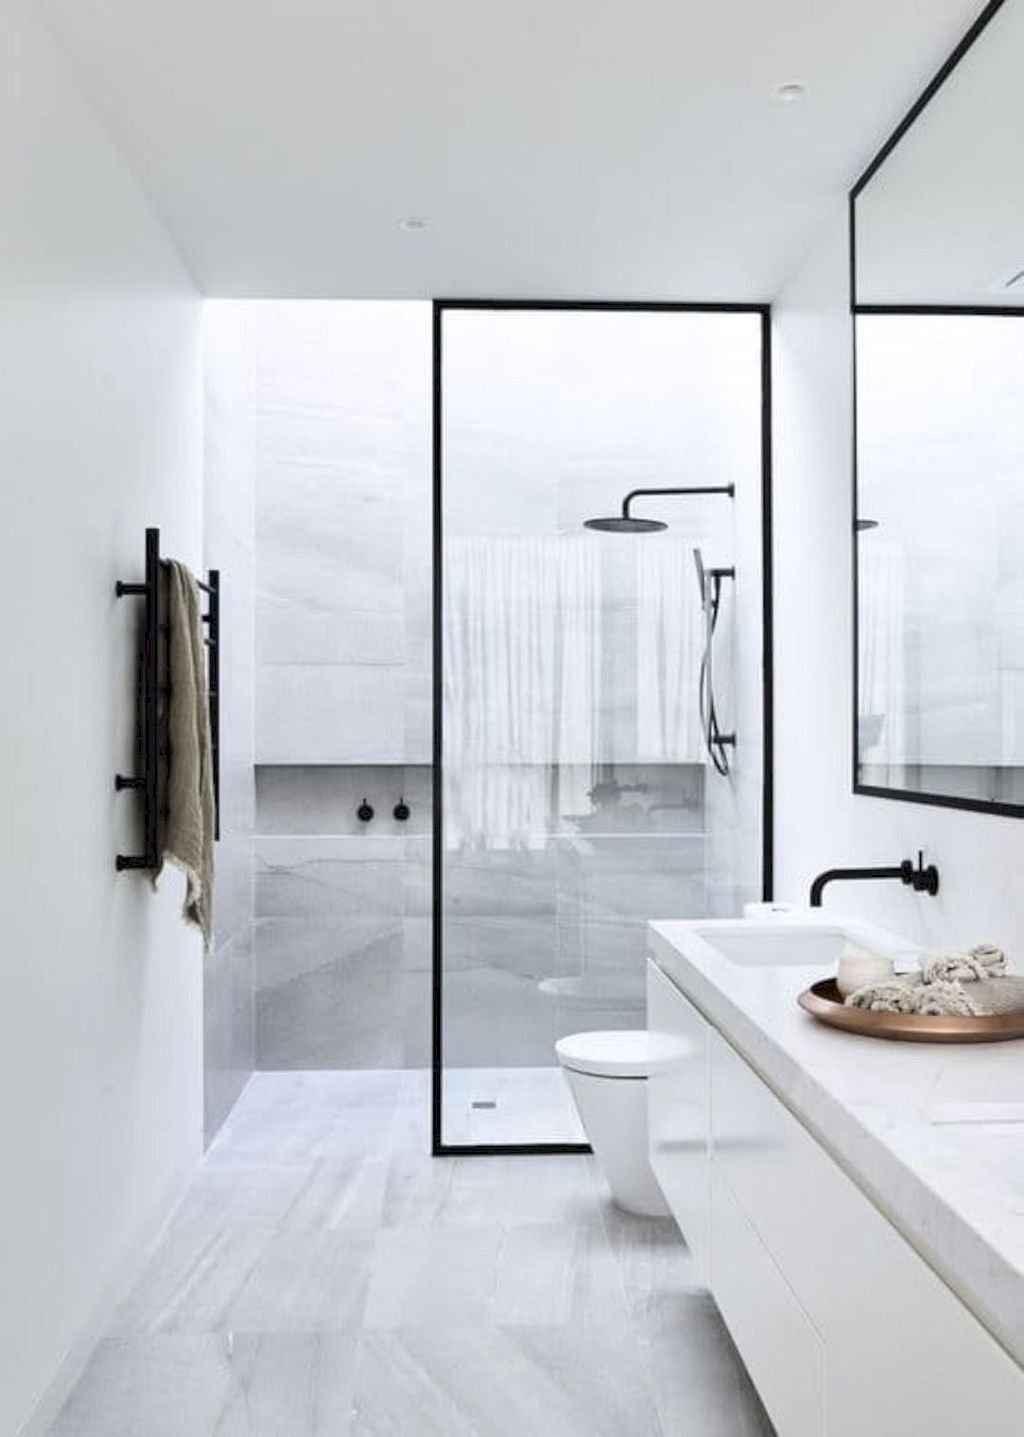 Inspiring apartment bathroom remodel ideas on a budget (34)